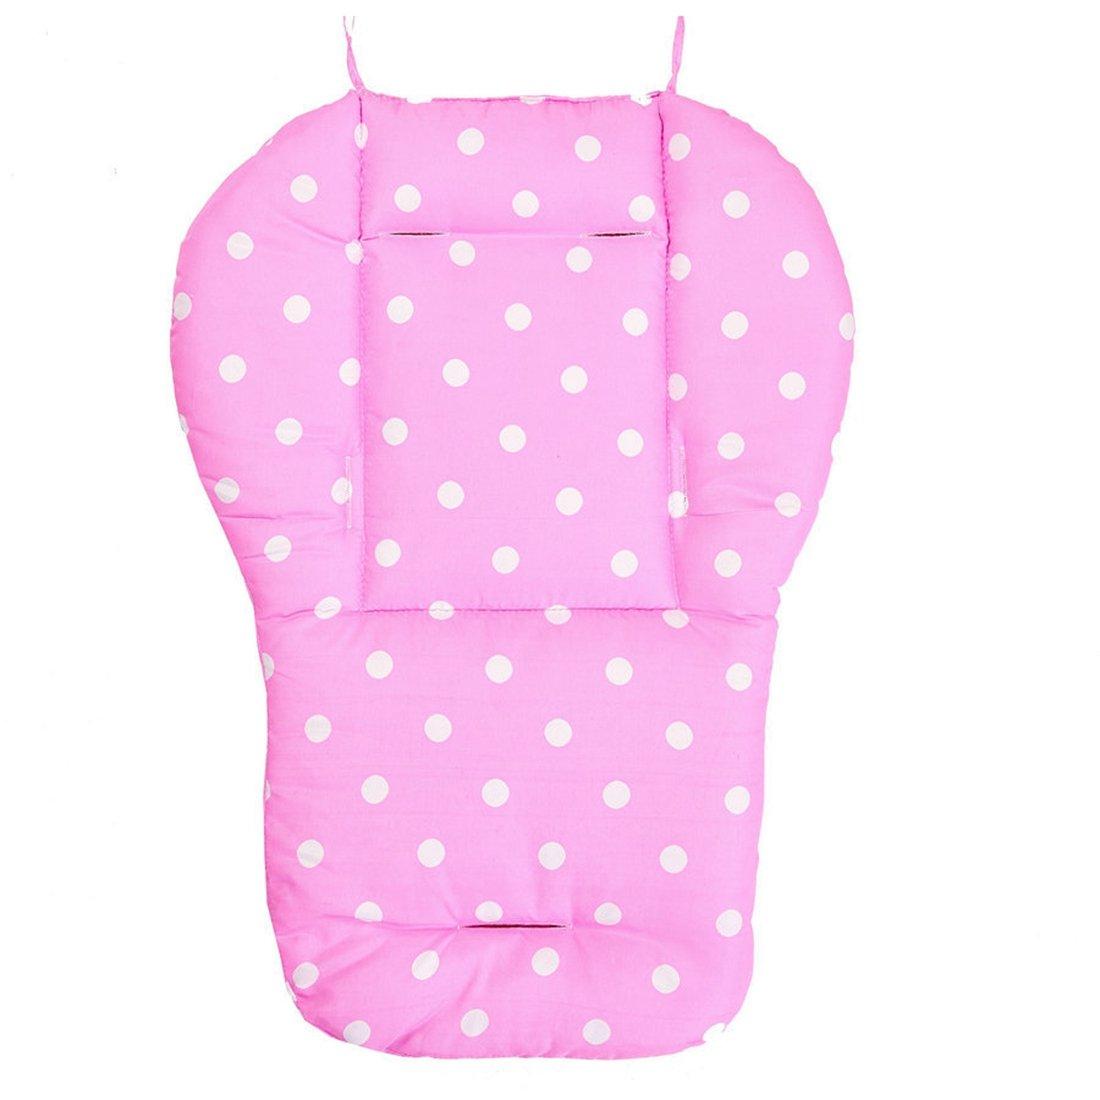 Freahap Baby Universal Stroller Pushchair Cushion Seat Pad Liner Mat Pink Hengfey